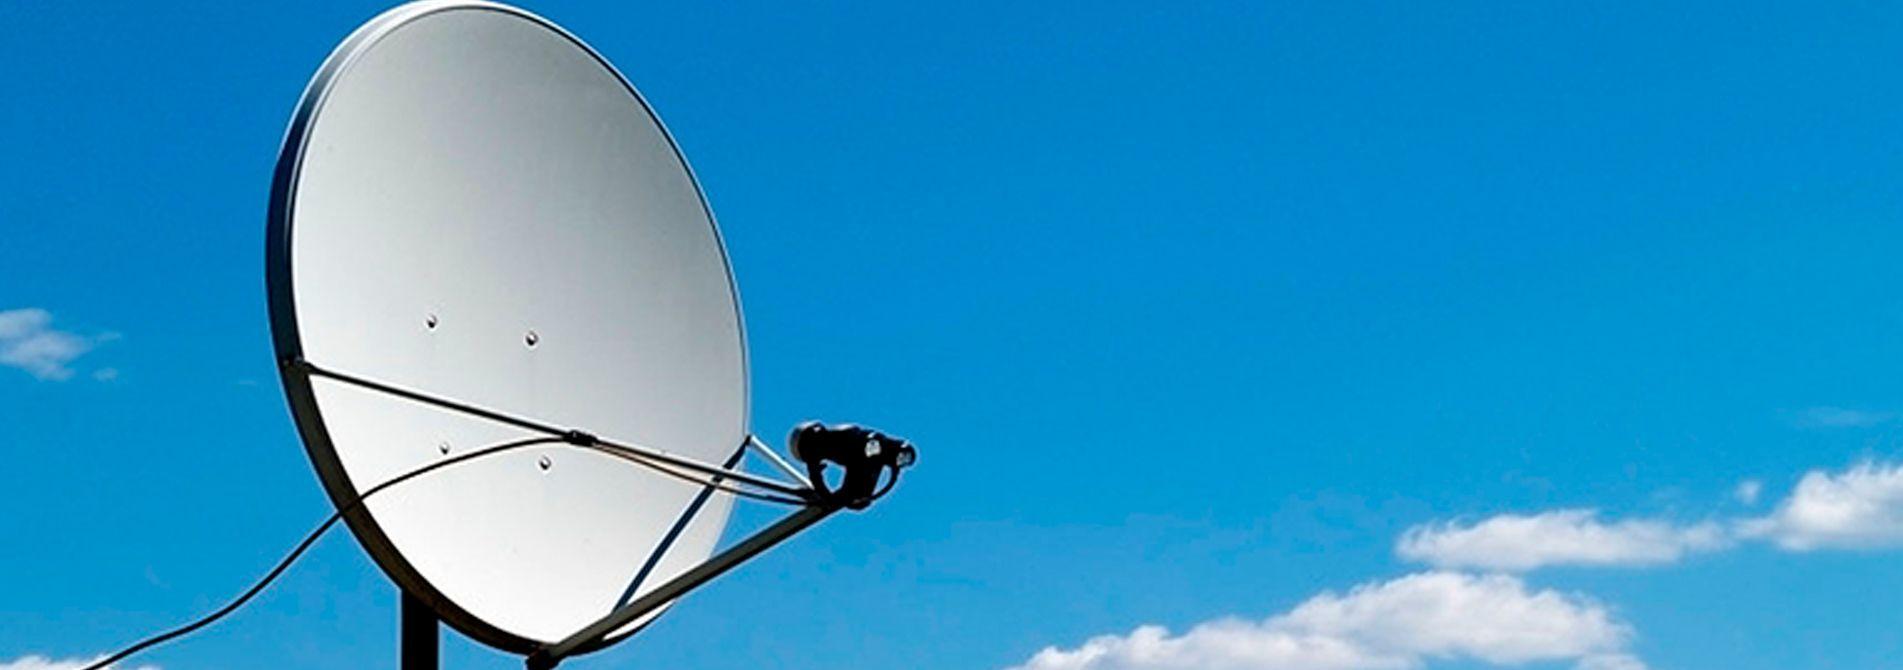 cabecera-antena SCE Cobre y fibra óptica